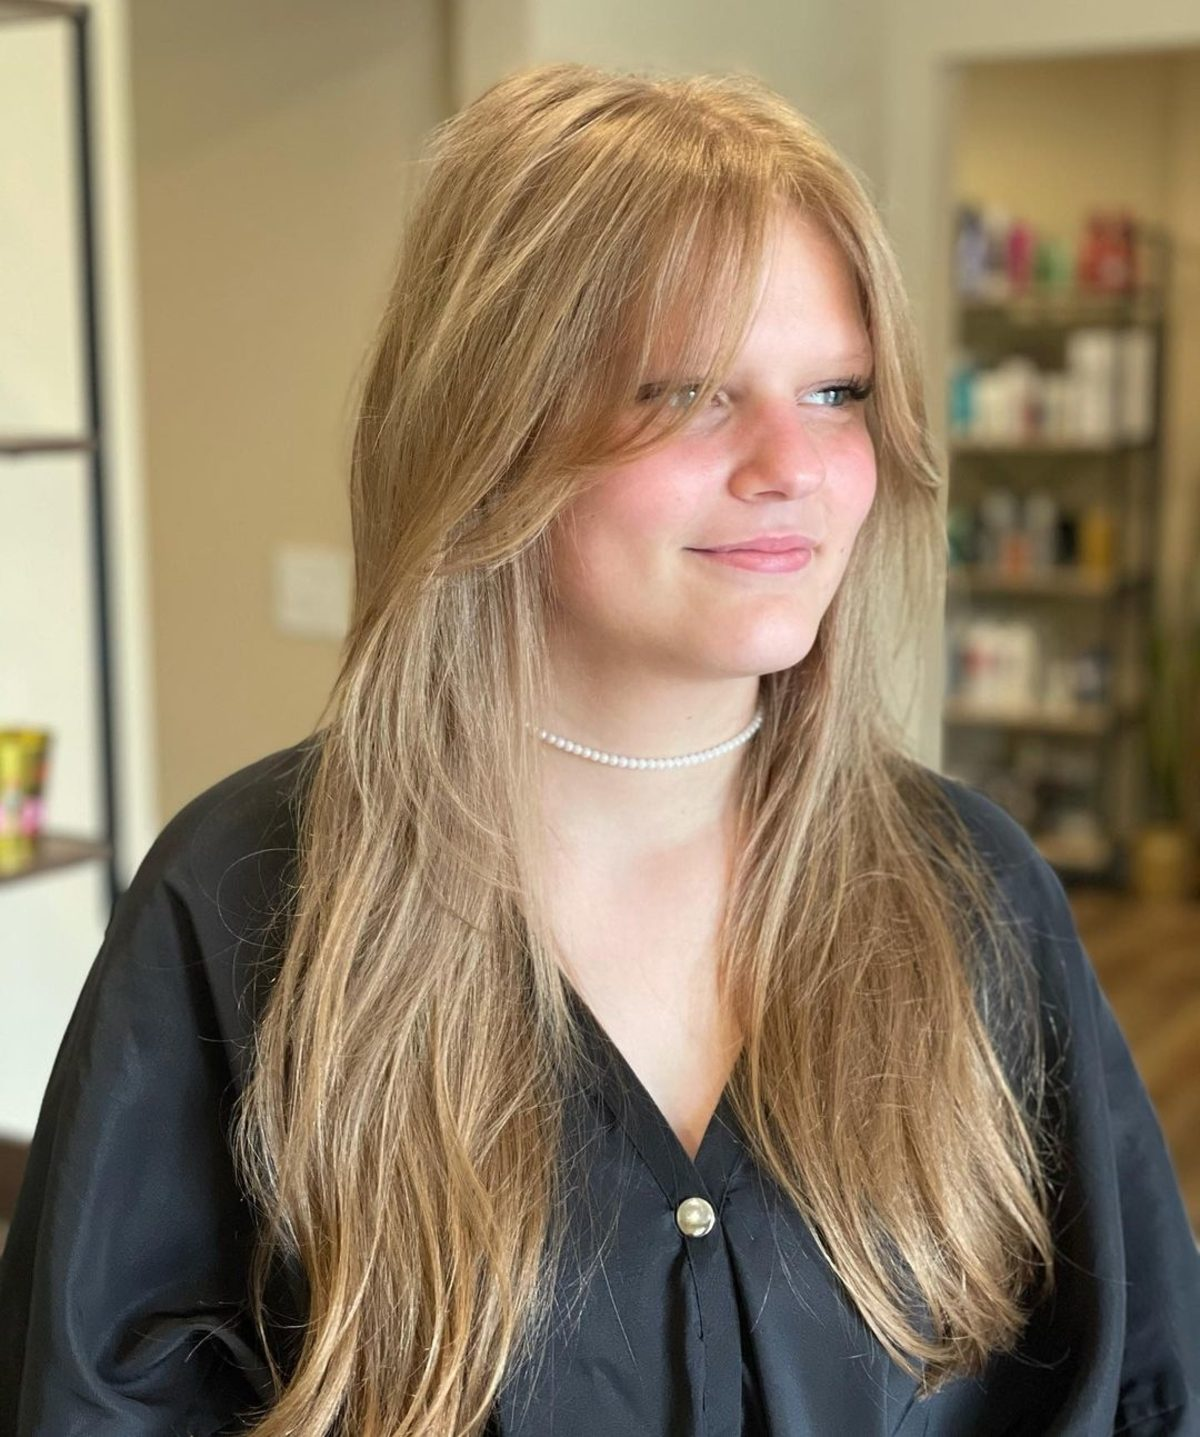 Low-maintenance Layered Haircut with Curtain Bangs